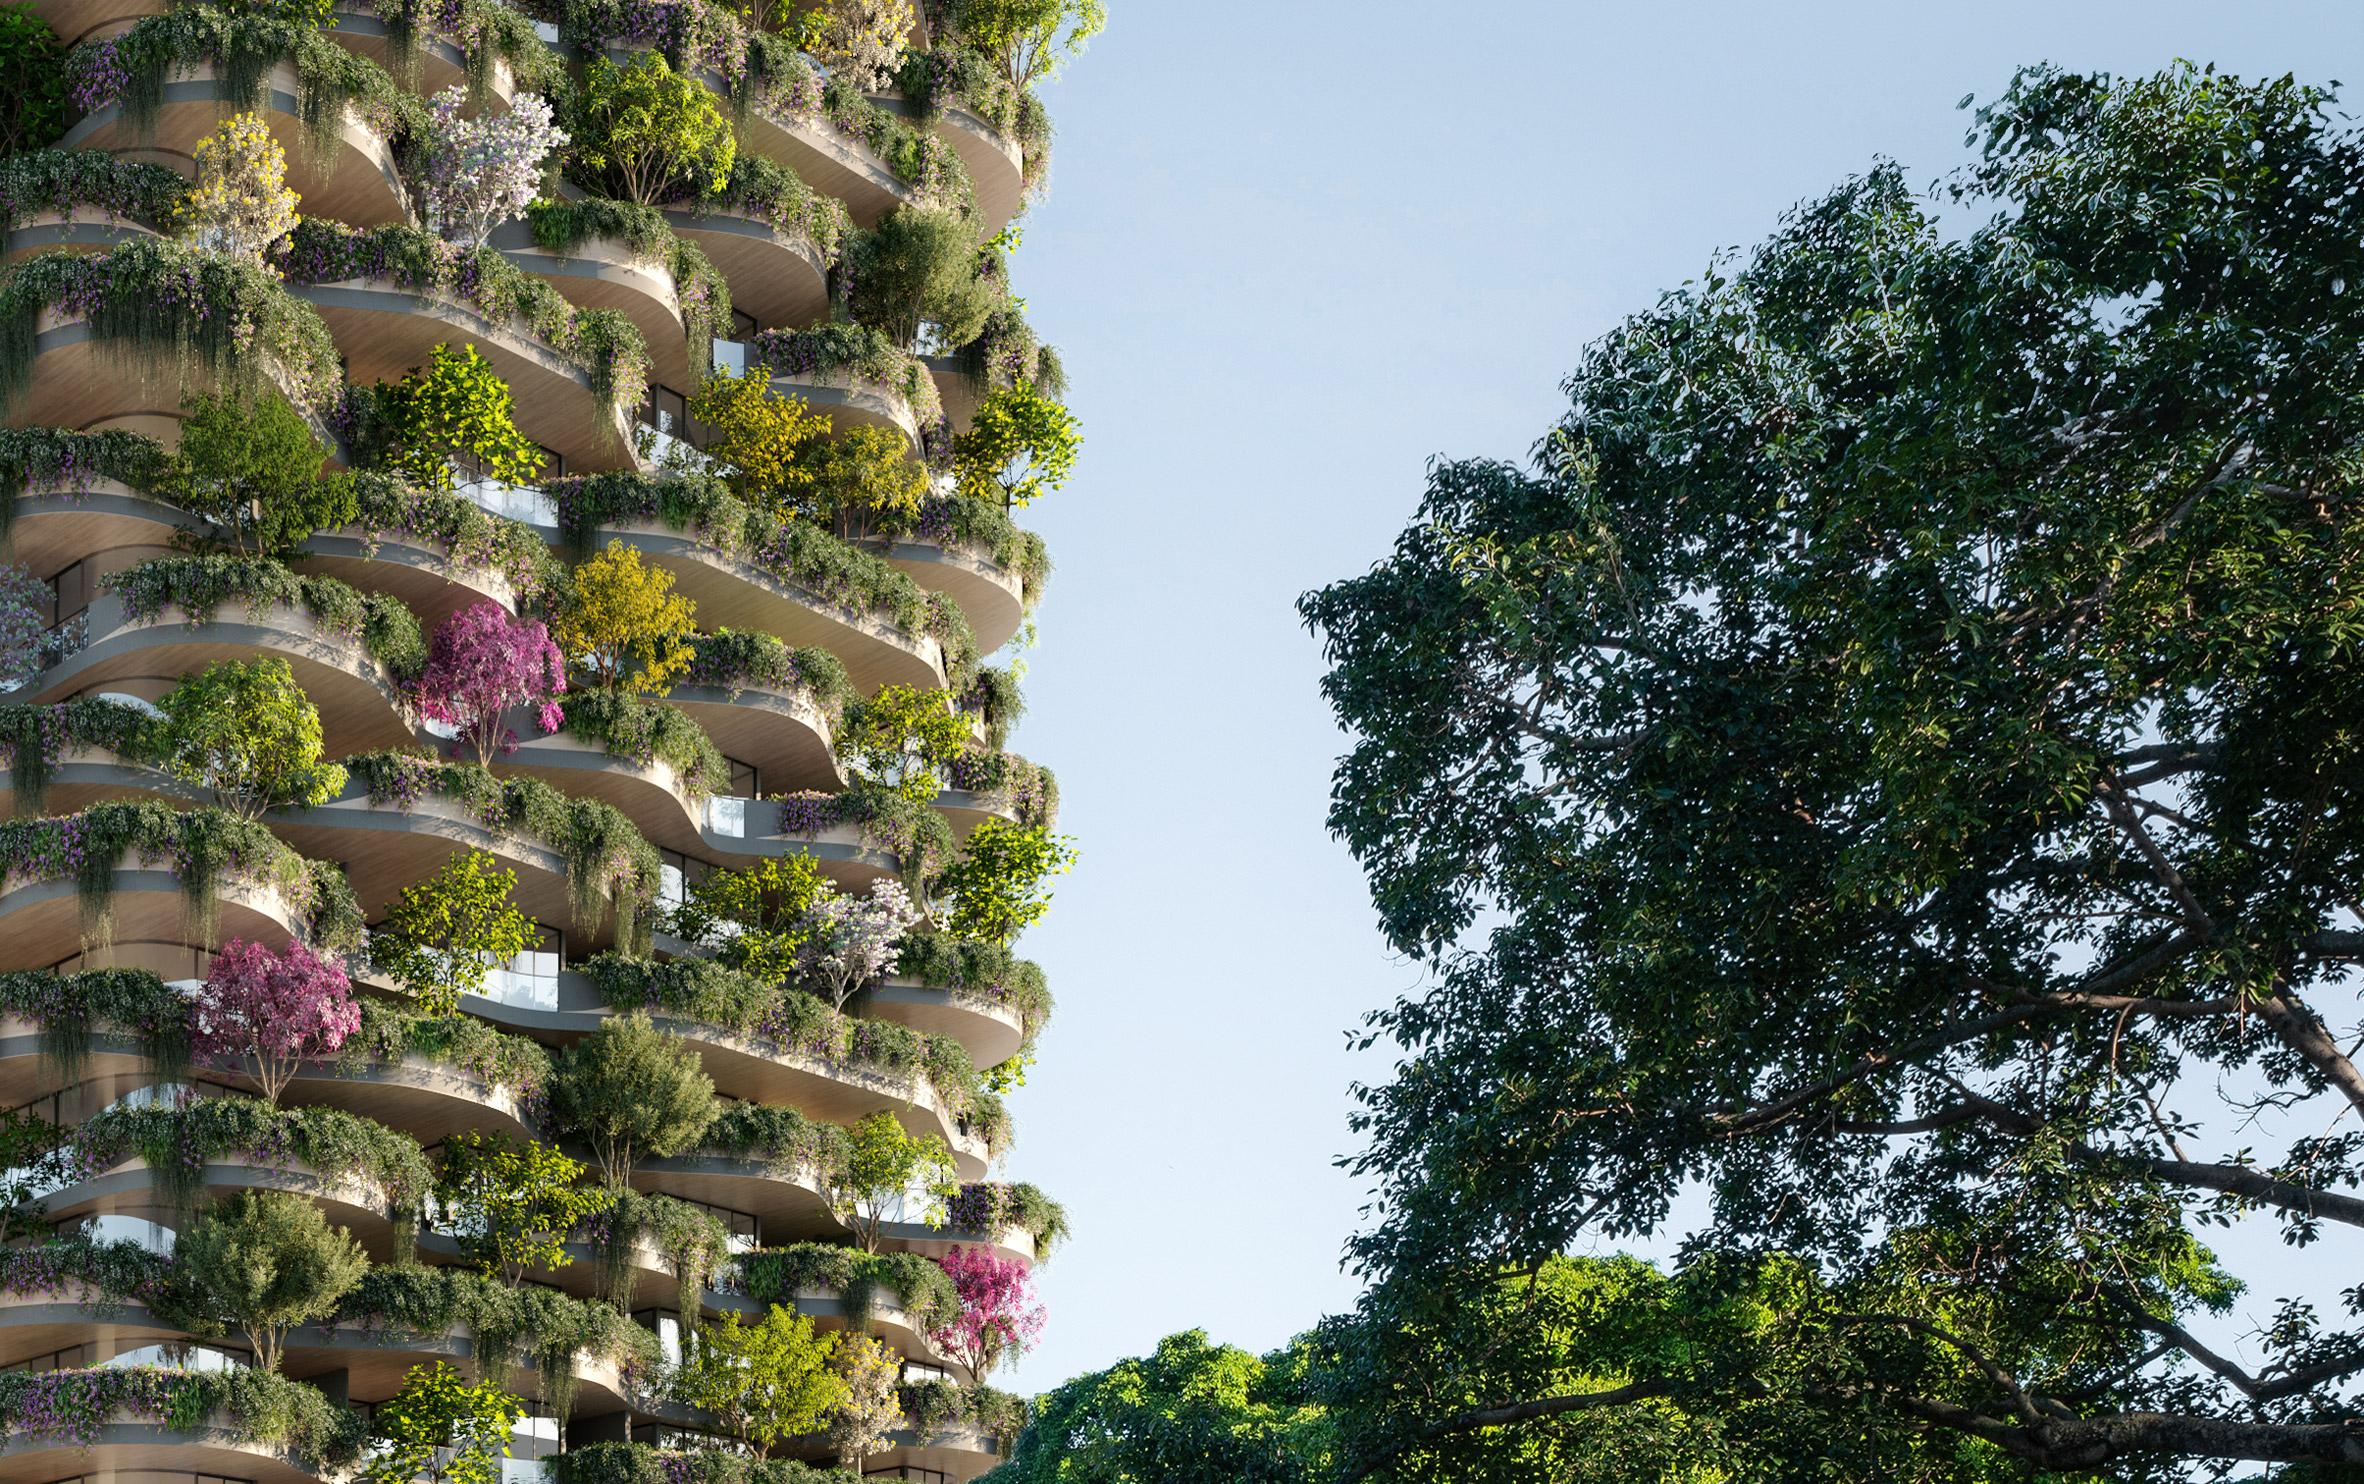 Un bosque en forma de rascacielo